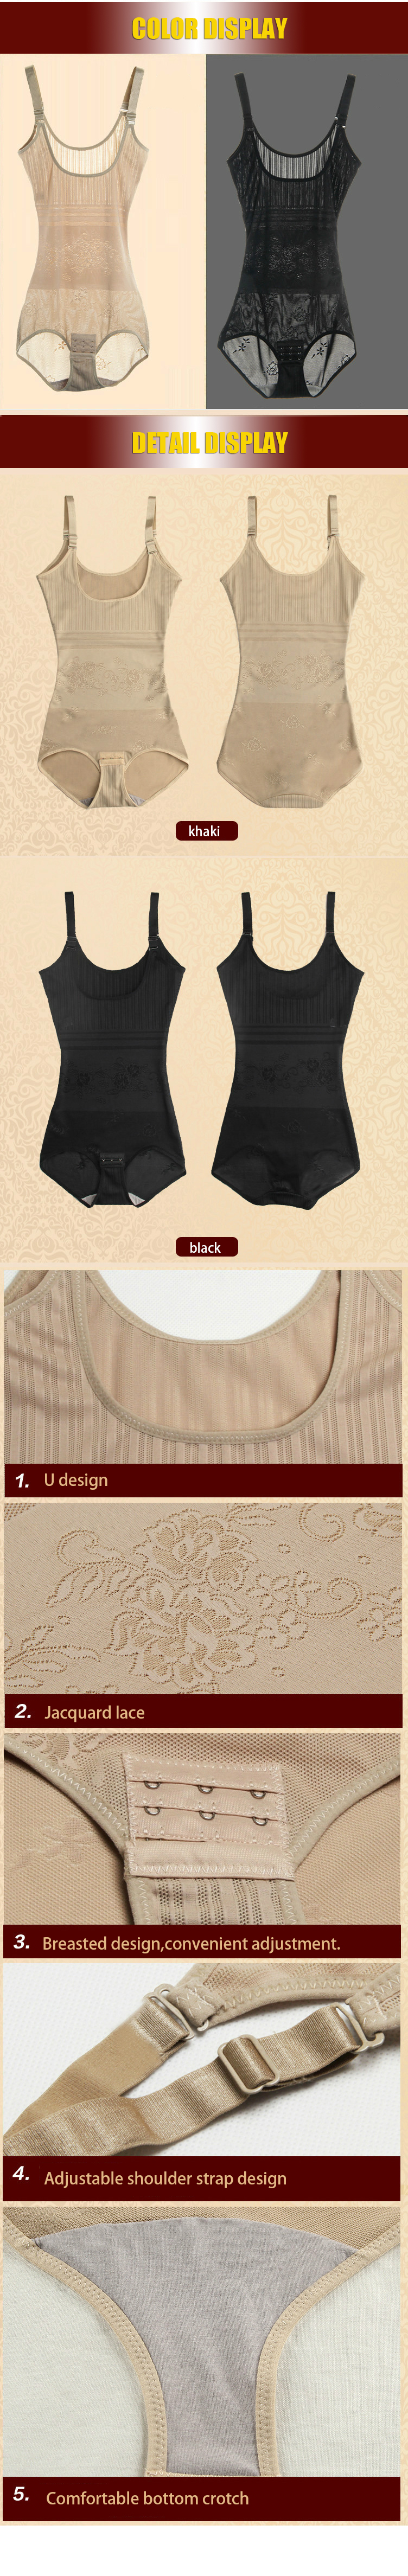 Women Post Natal Postpartum Slimming Underwear Shaper Recover Bodysuits Shapewear Waist Corset Girdle Black/Apricot Hot sale 7